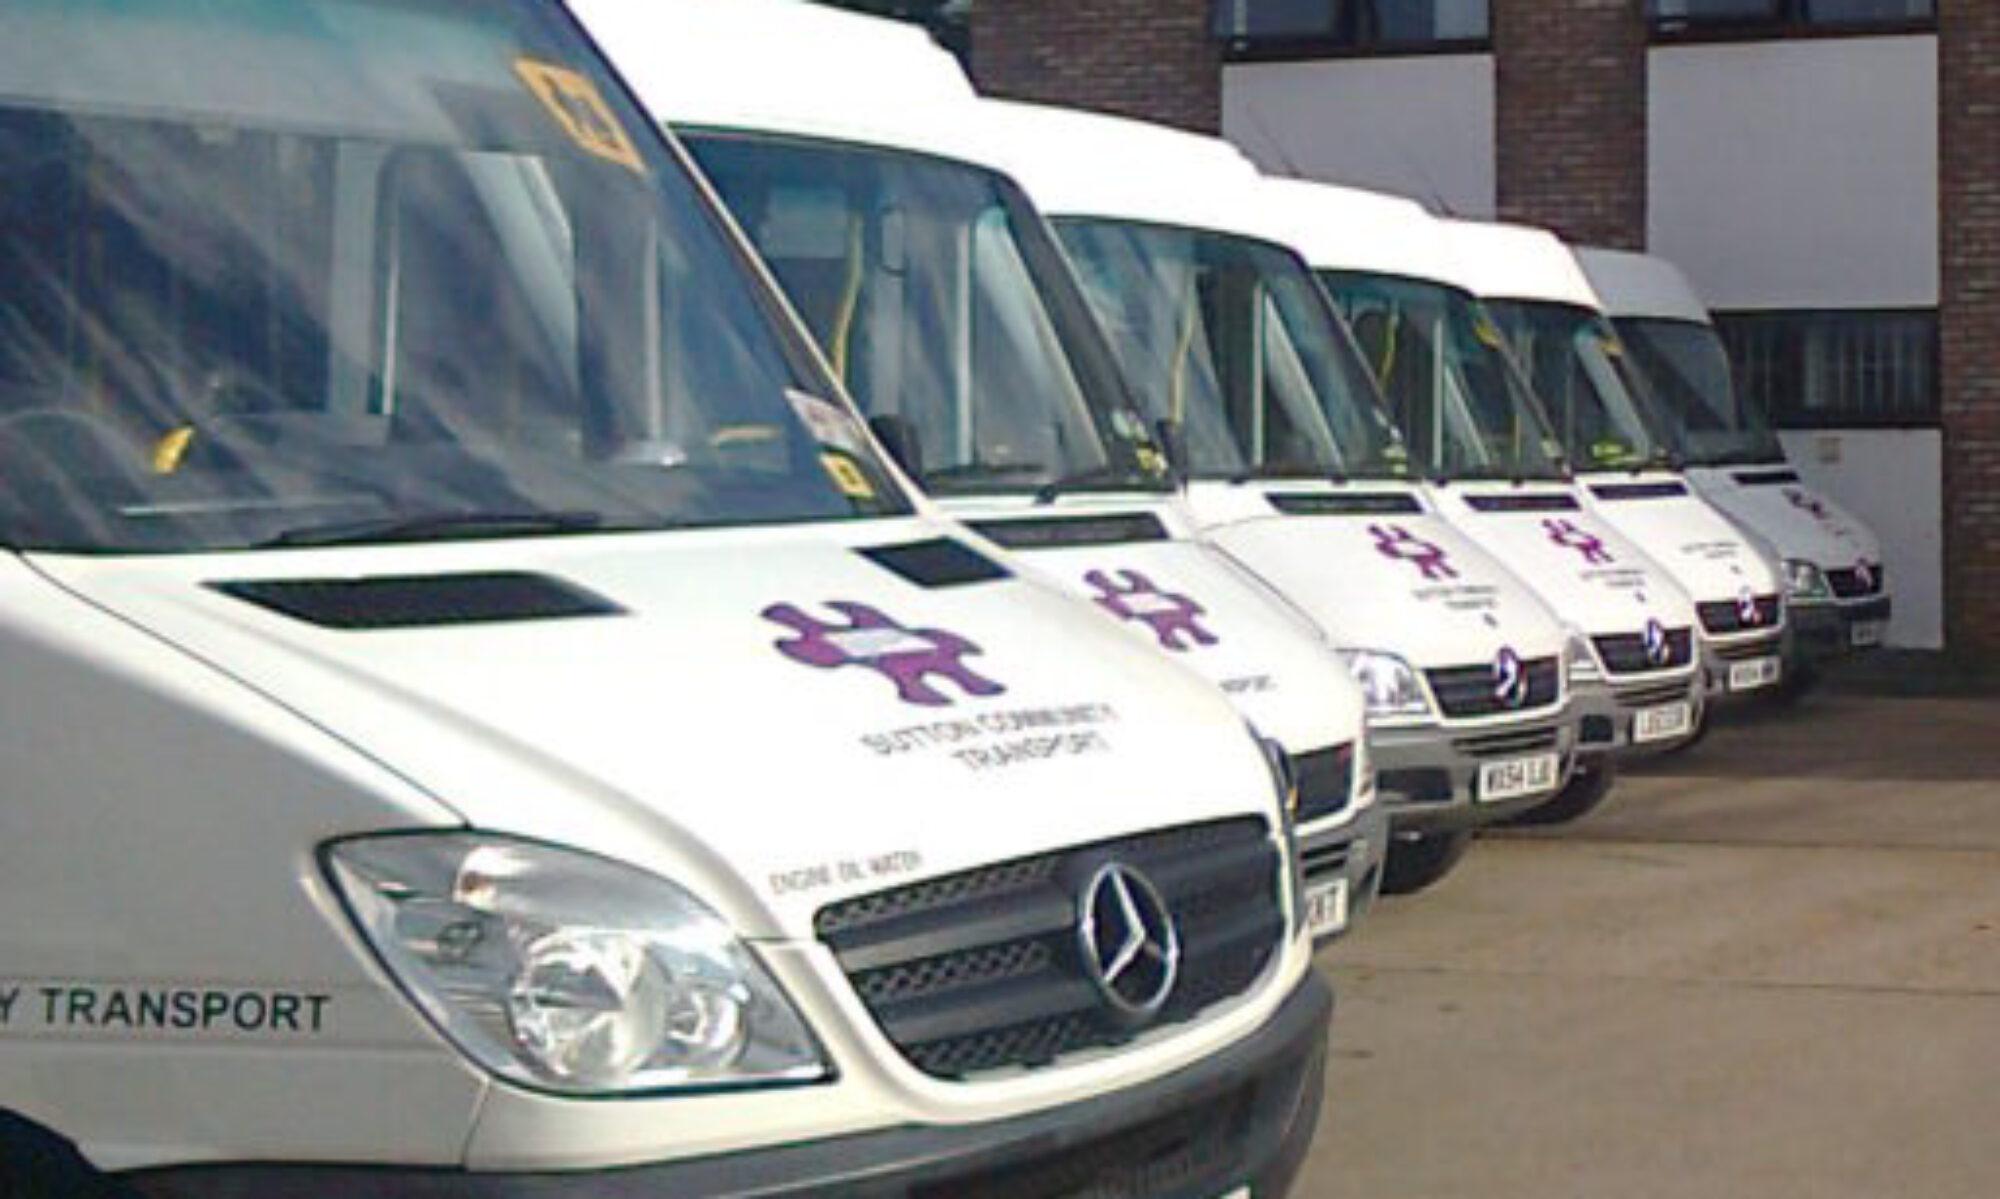 Sutton Community Transport